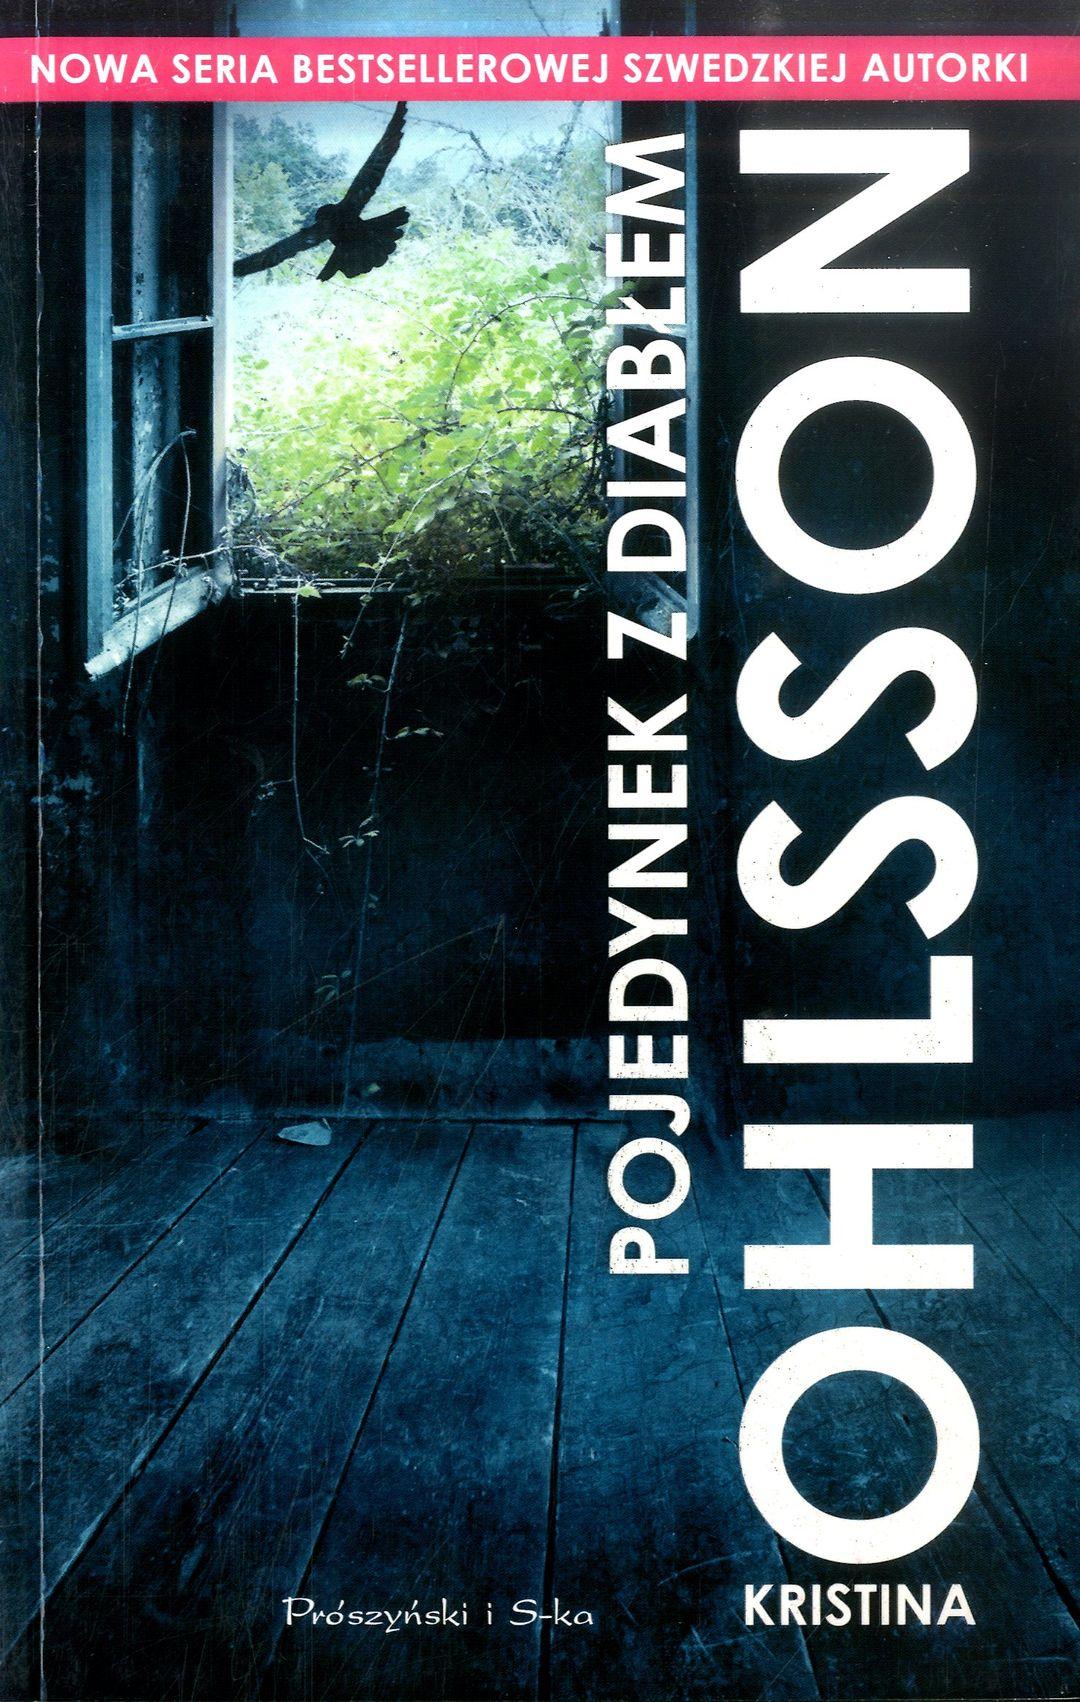 Ohlsson Kristina – Pojedynek Z Diabłem